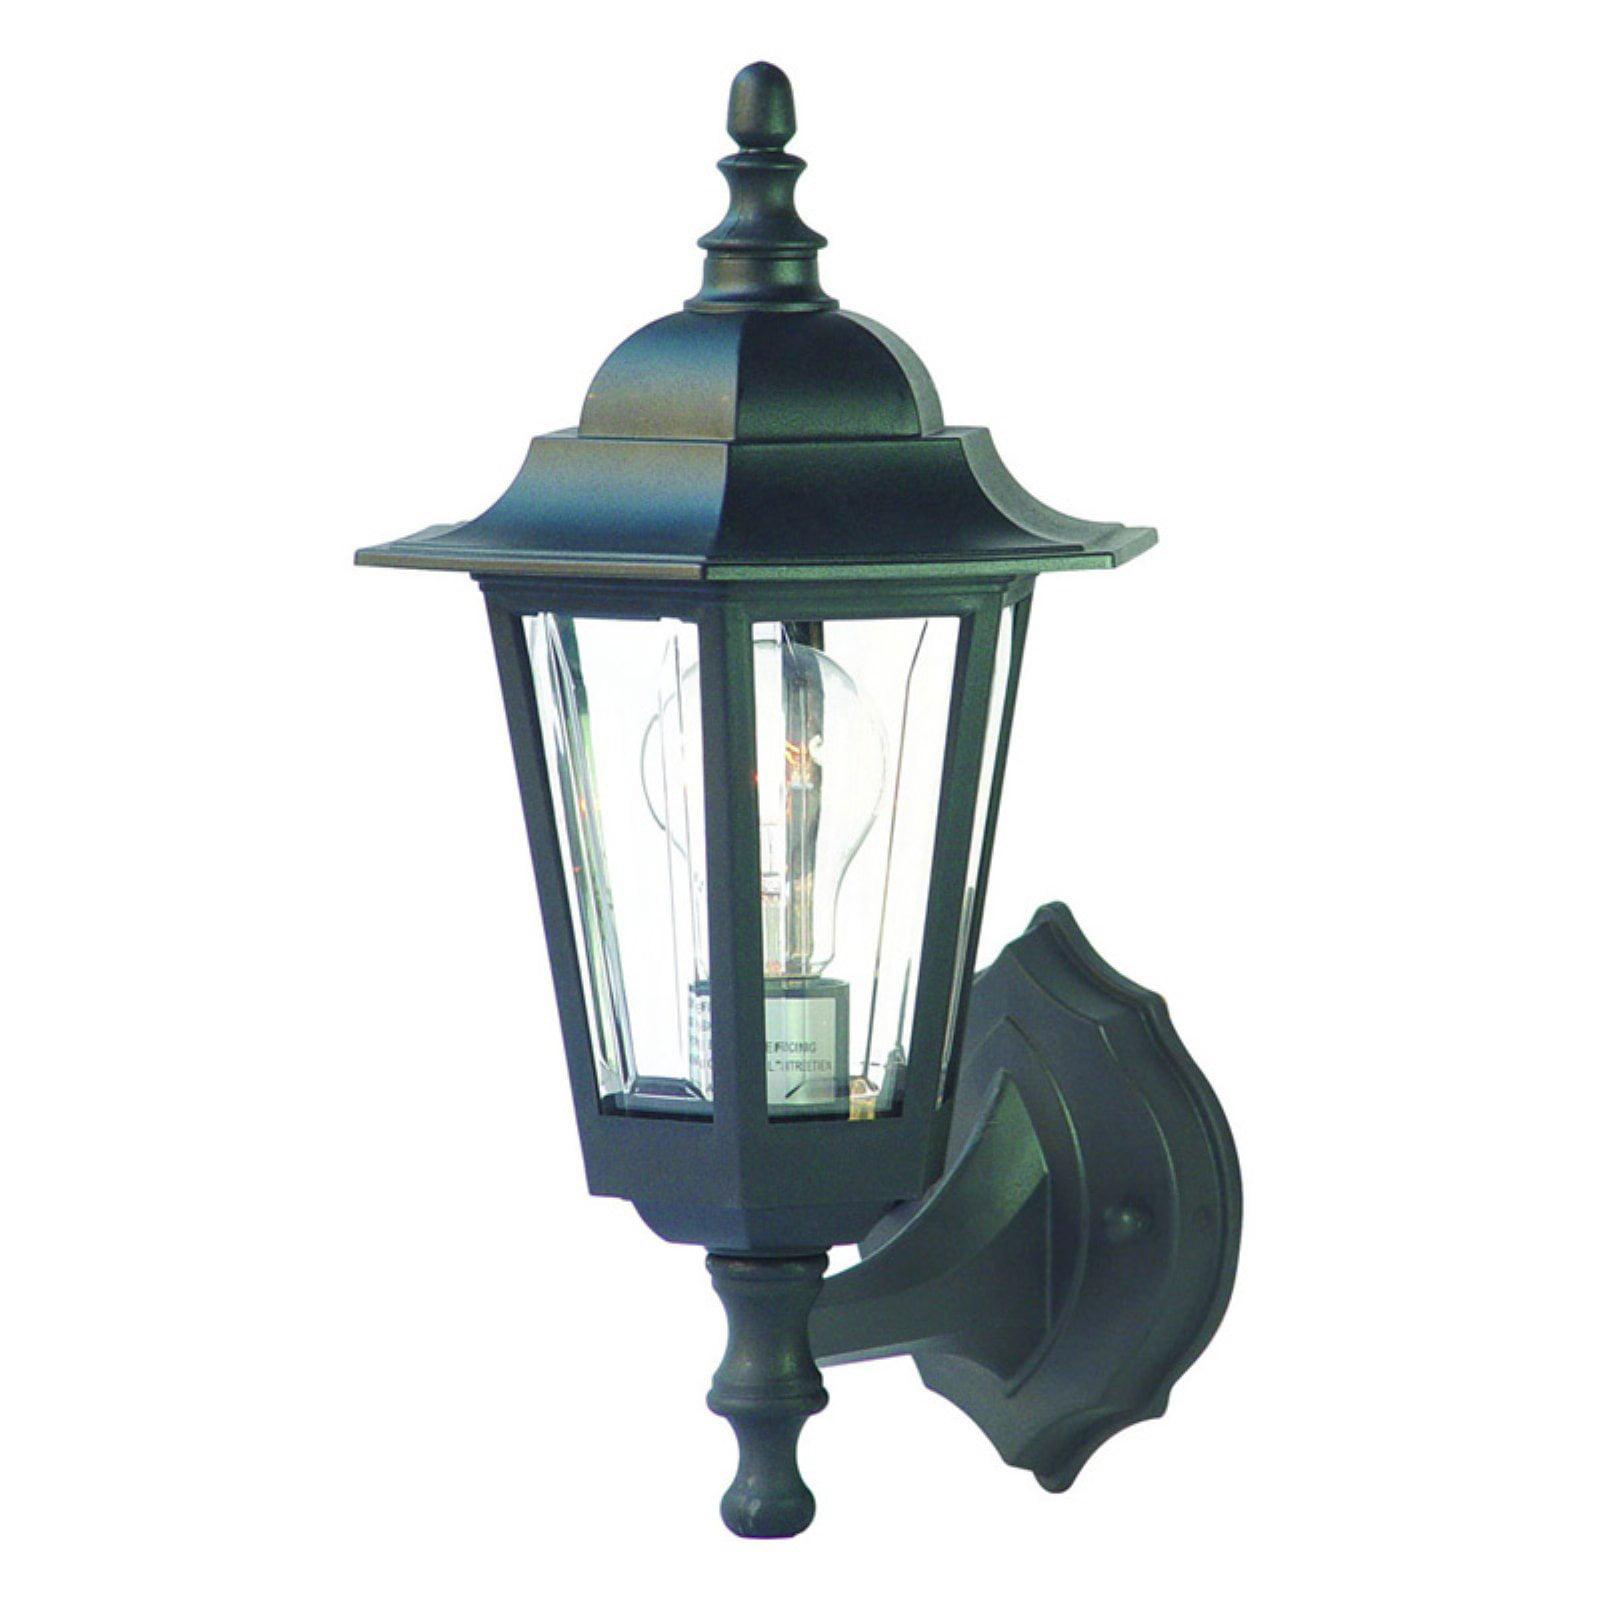 Acclaim Lighting Tidewater Outdoor Wall Mount Light Fixture